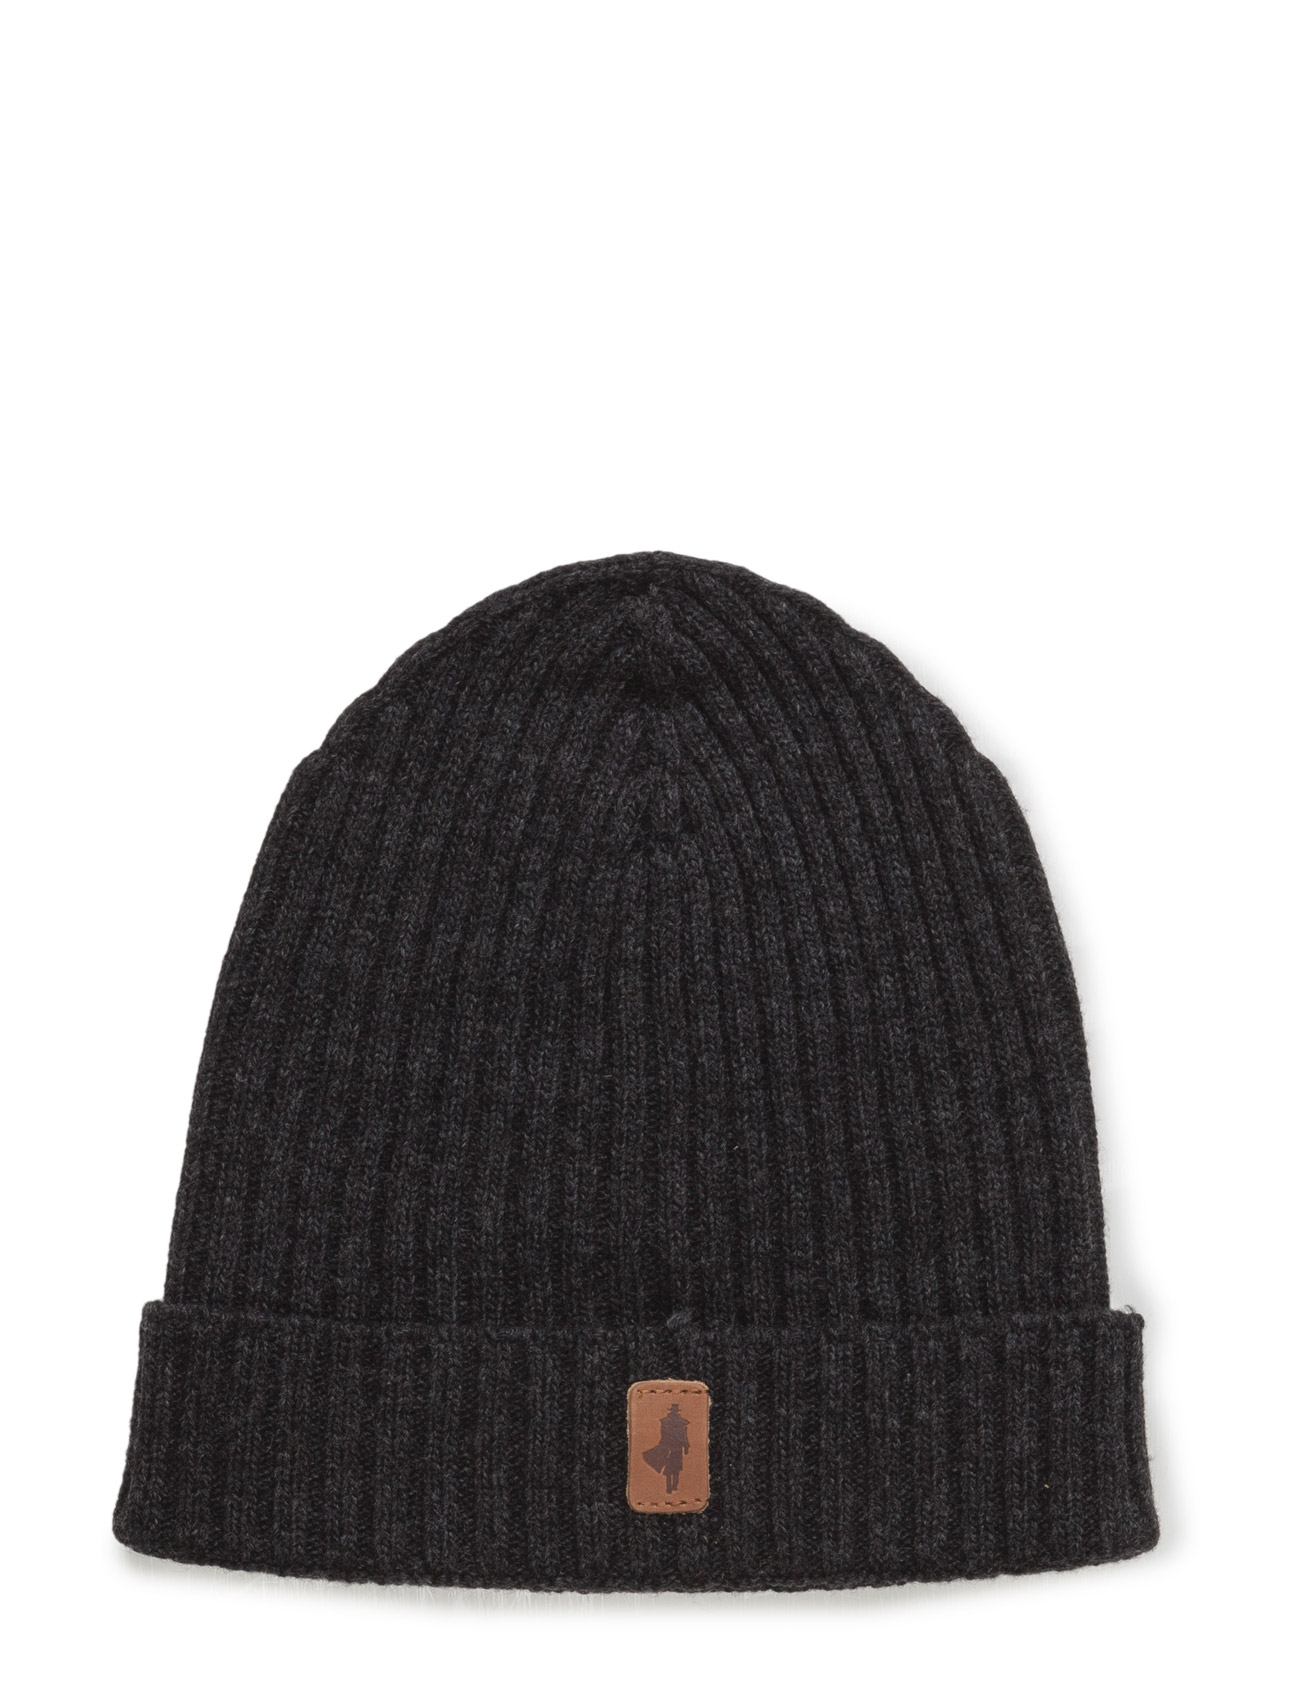 Hats-Caps-Mlm MCS Hatte & Caps til Herrer i antracit